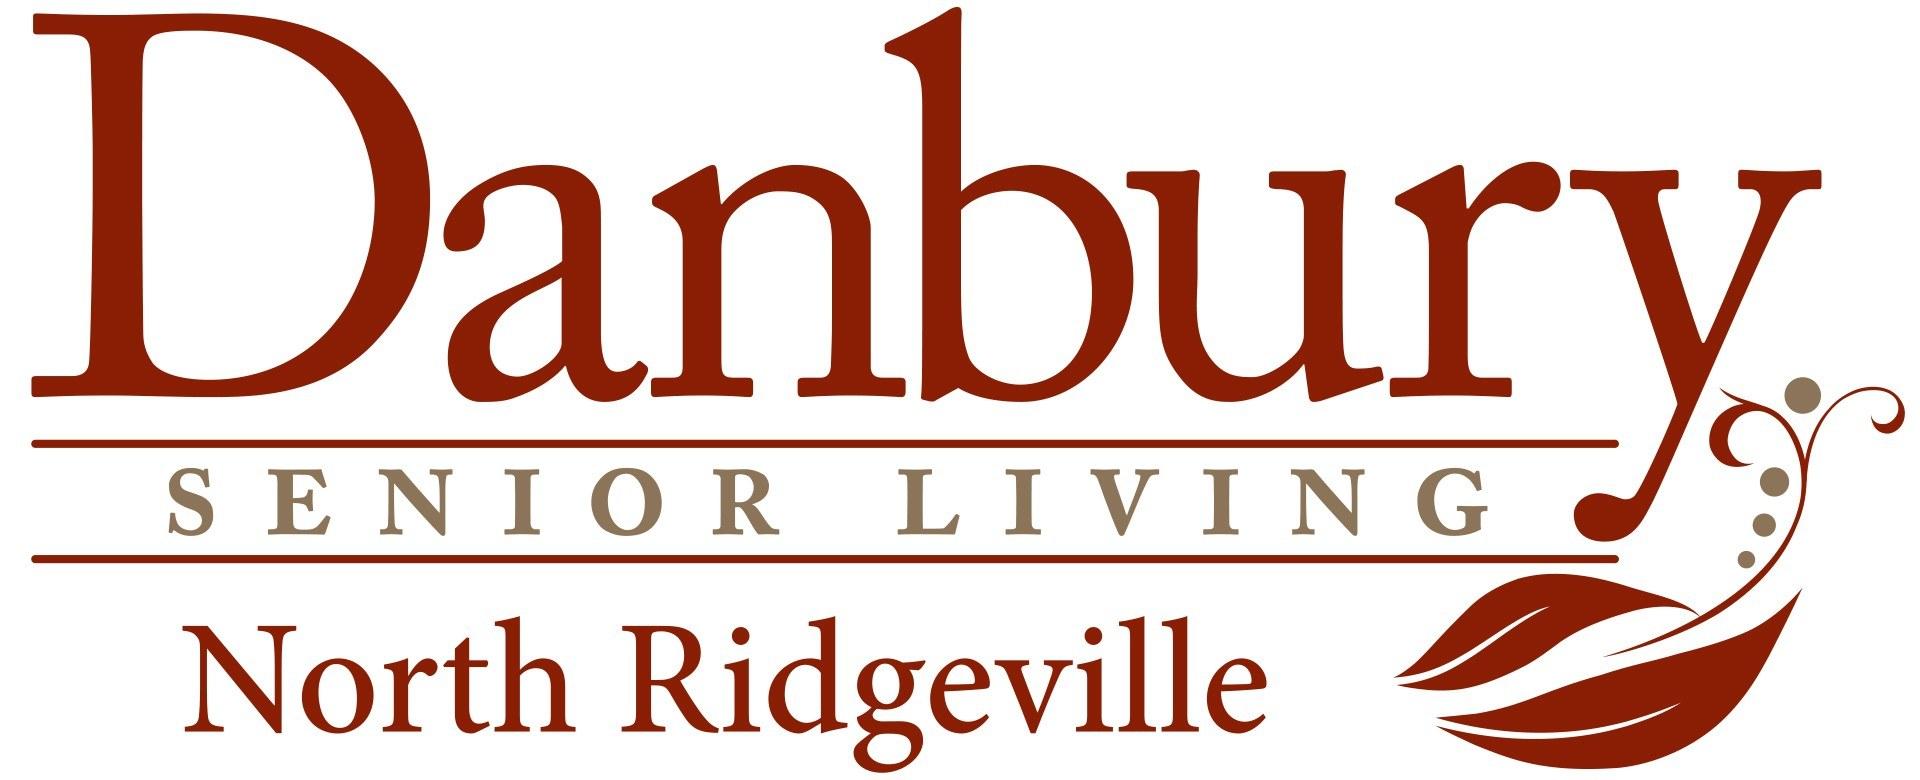 logo for Danbury Senior Living - North Ridgeville